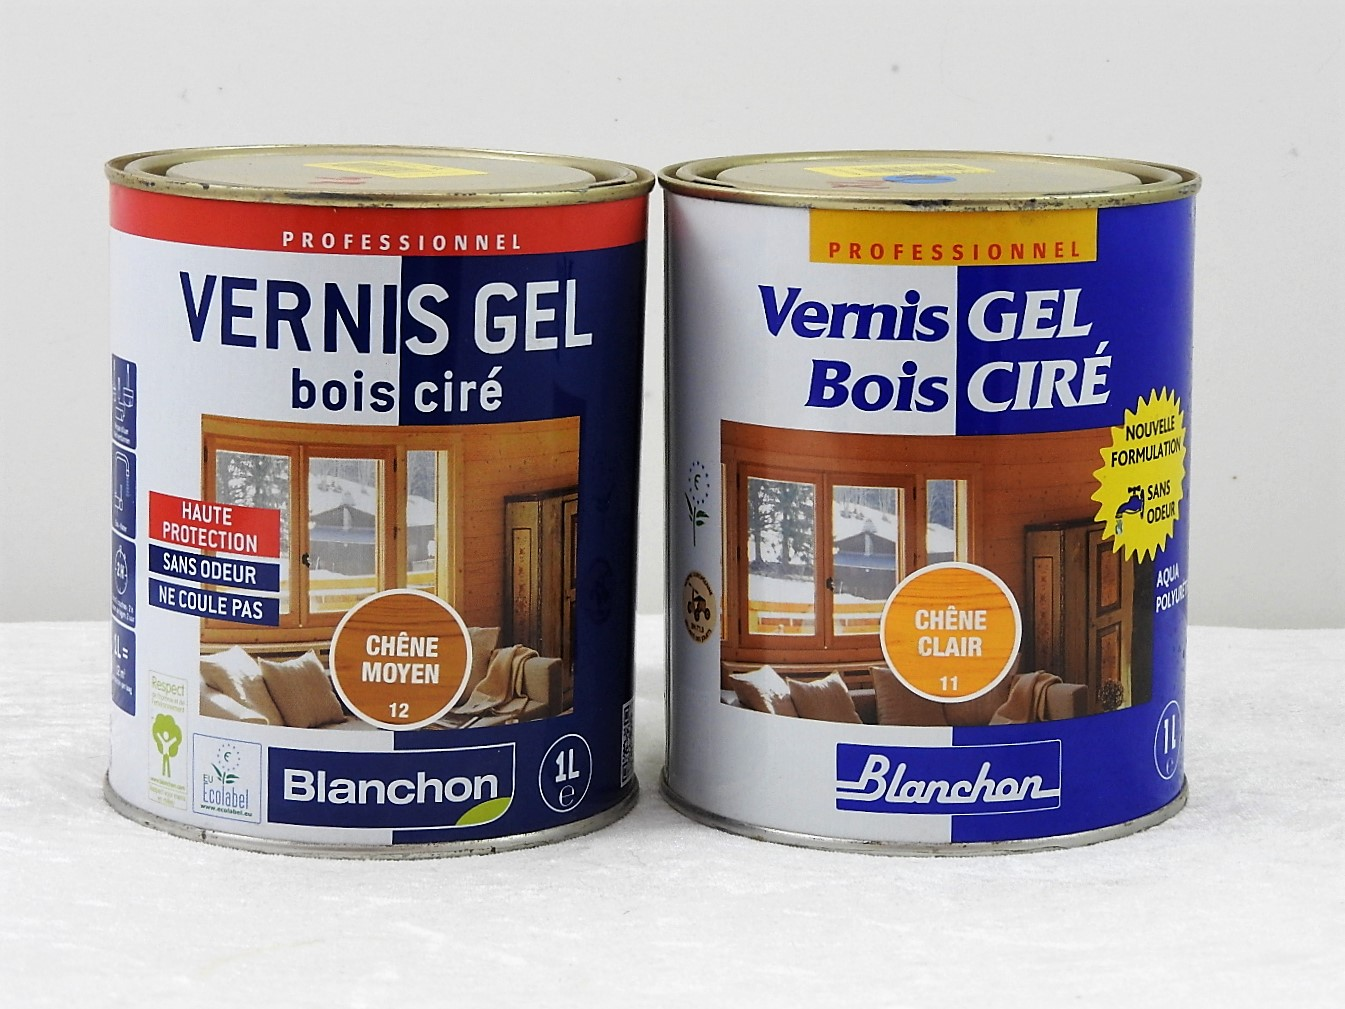 vernis gel bois cir blanchon 1 l blanchon vernis gel b c blanchon 1 g 39 peint destockage de. Black Bedroom Furniture Sets. Home Design Ideas